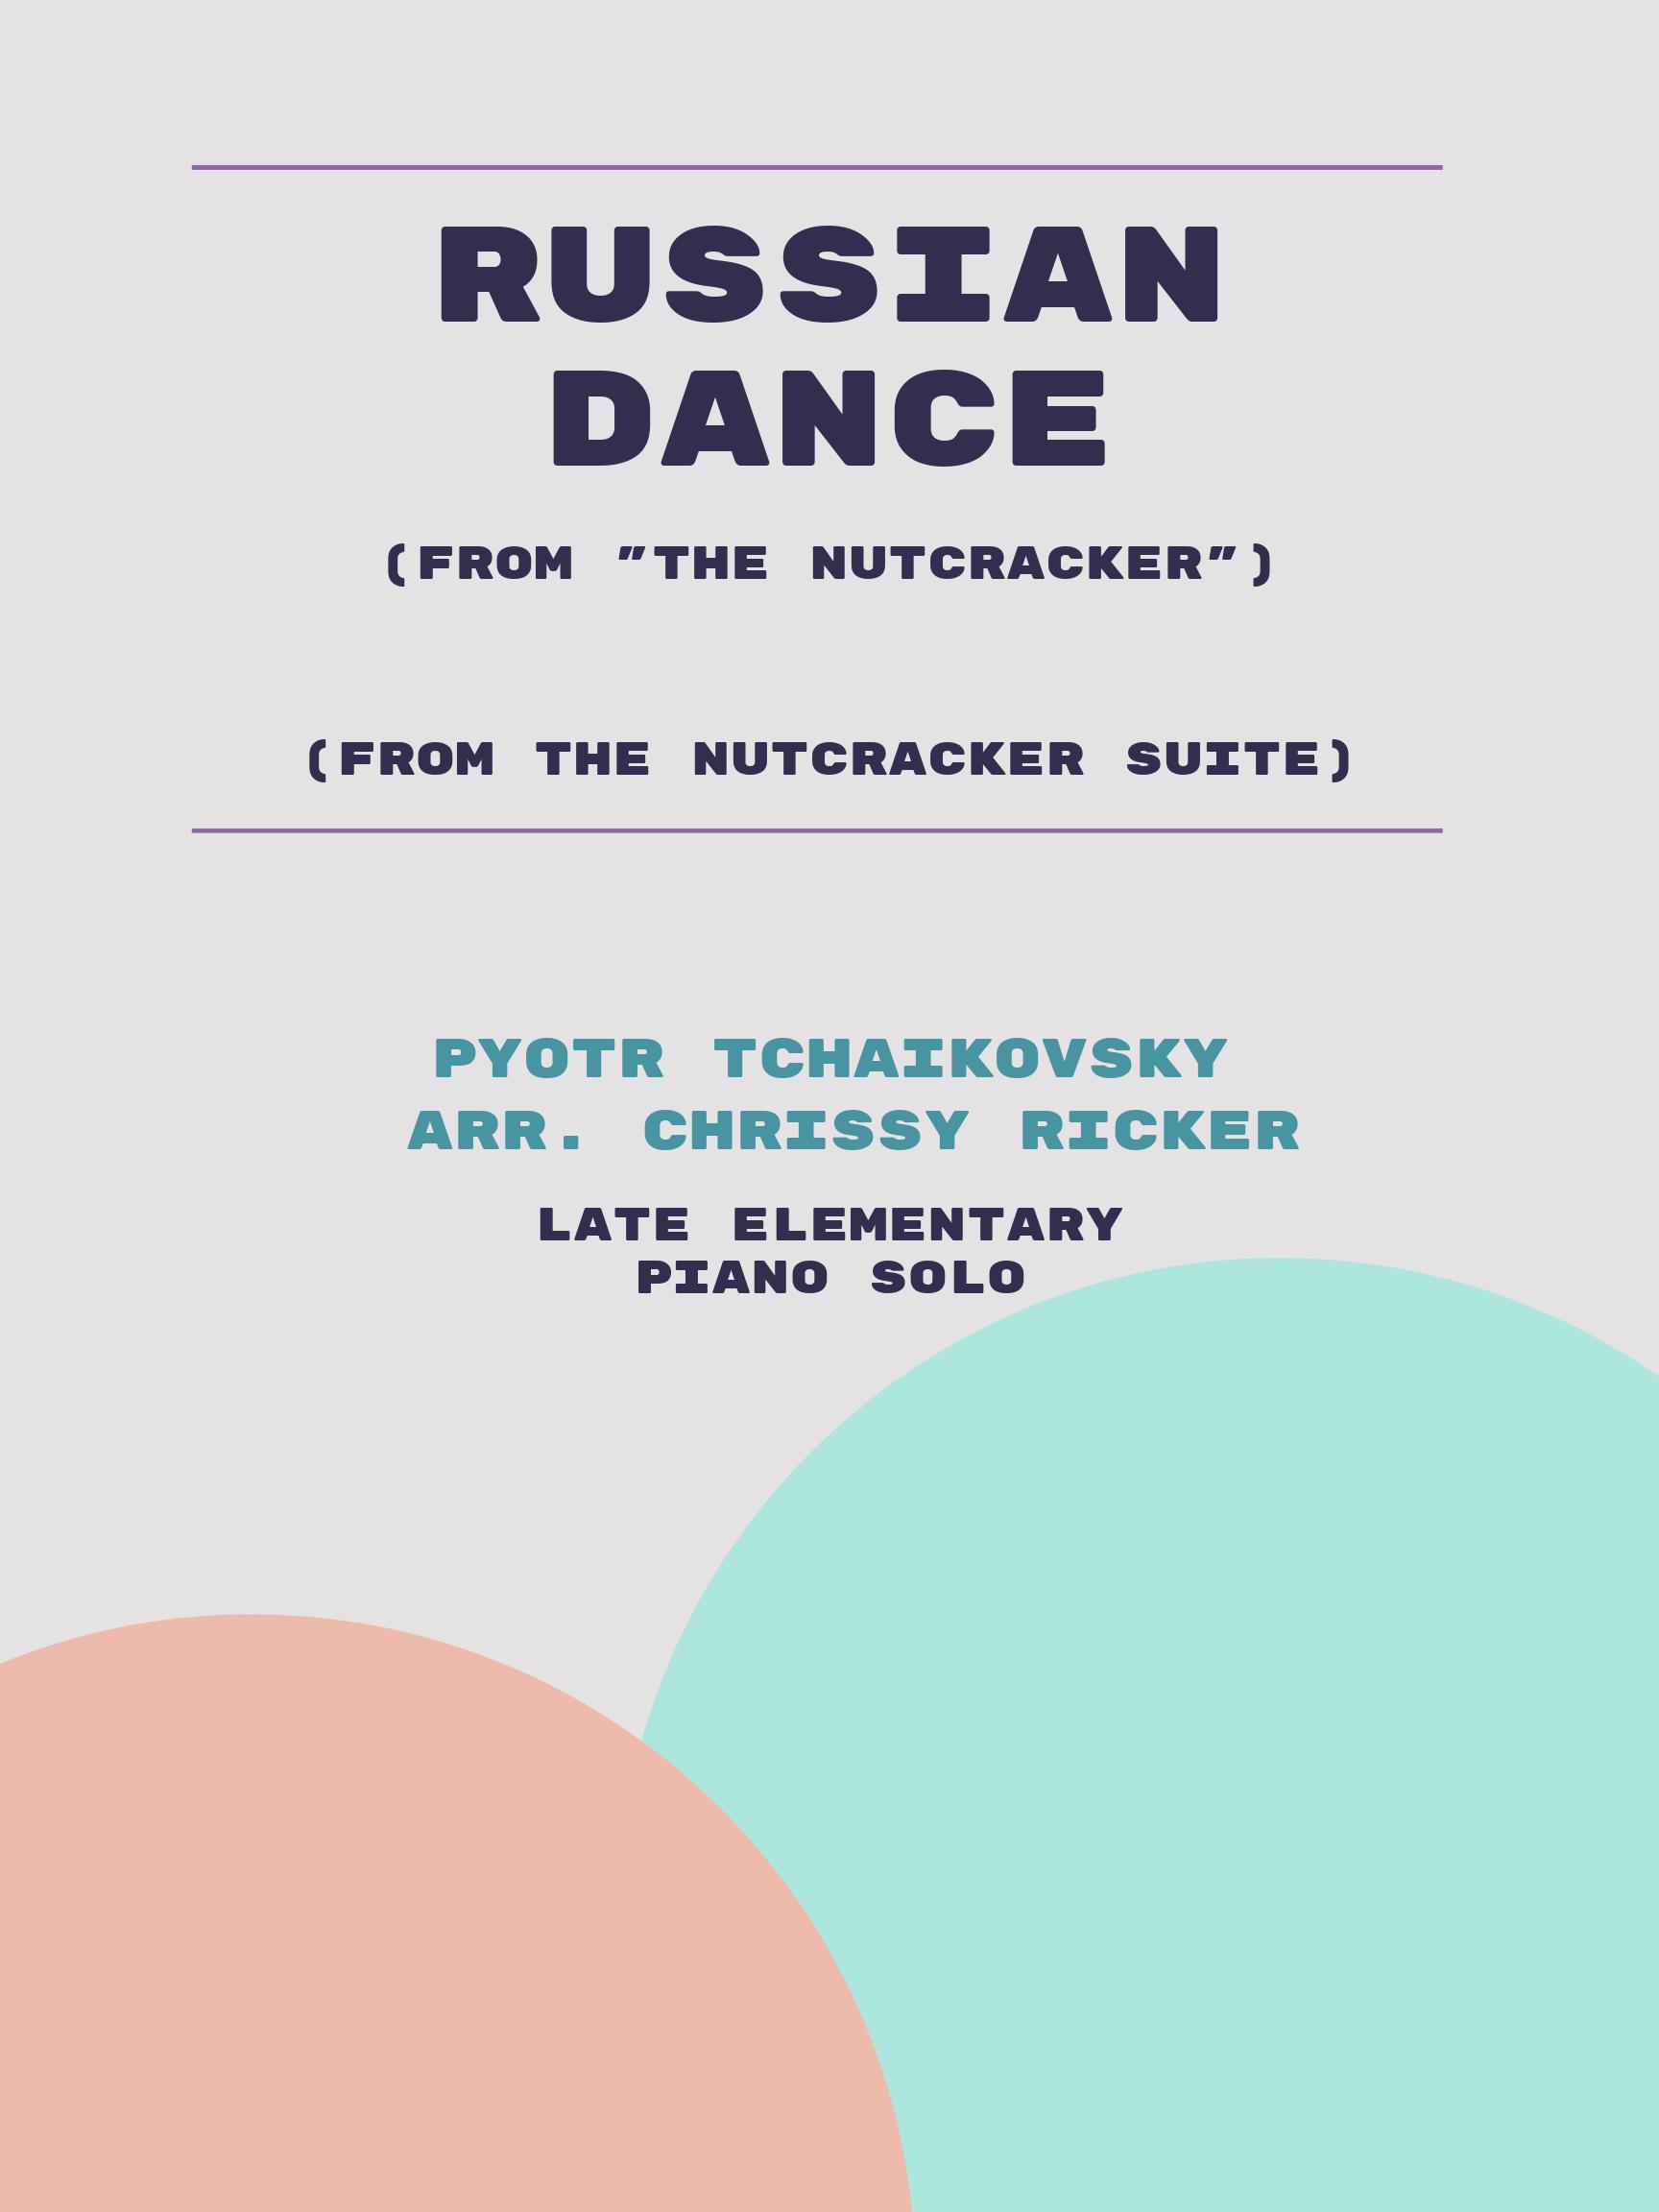 Russian Dance by Pyotr Tchaikovsky